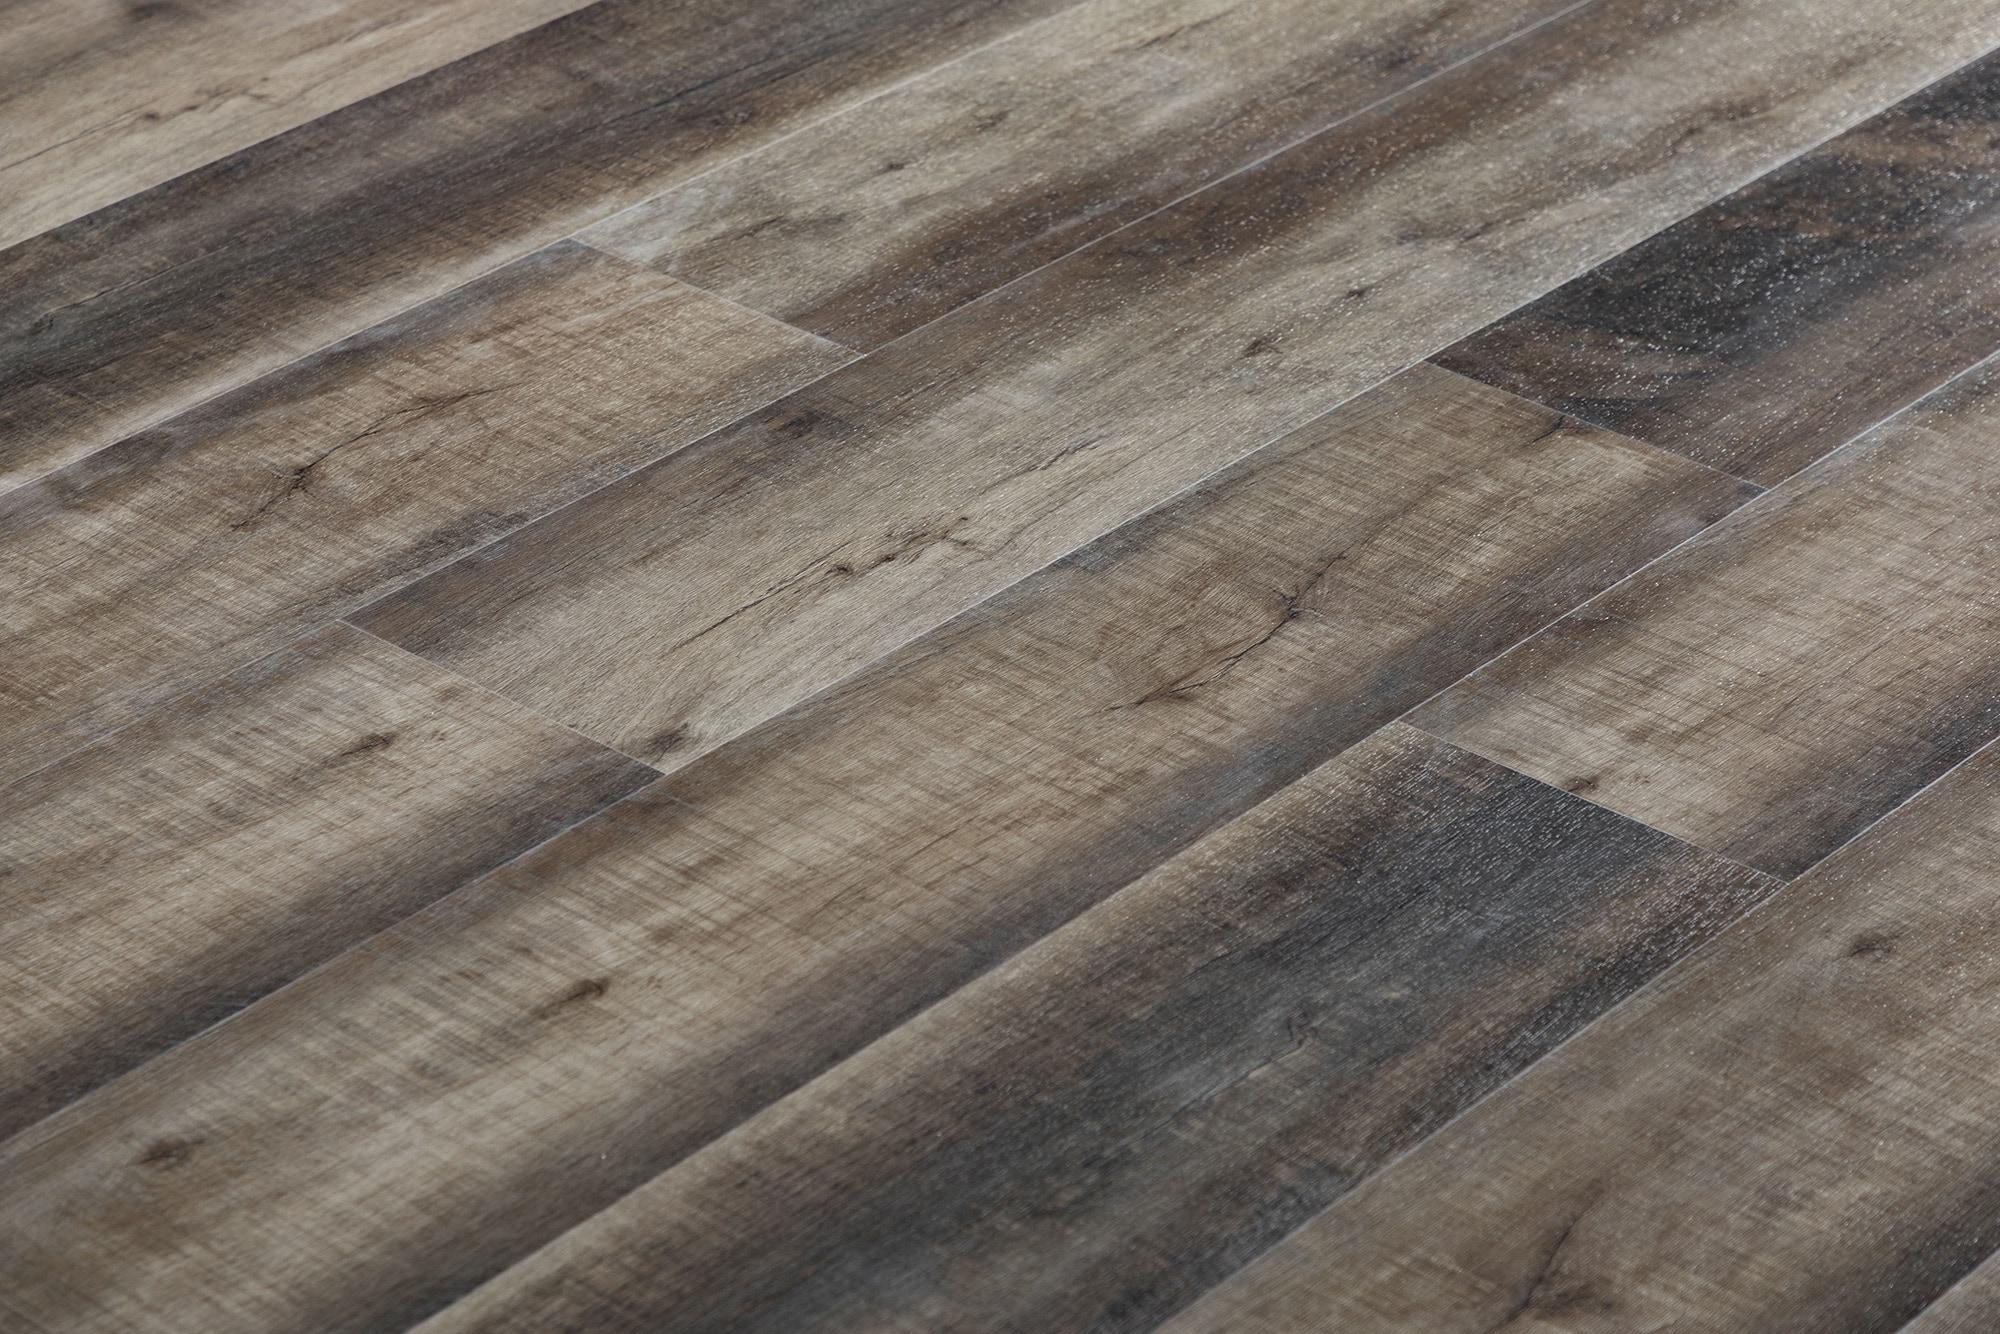 Harvest Brushed French Oak / 6.5mm / SPC / Click Lock Vinyl Planks - 6.5mm SPC Click Lock - XL Jumbo Collection 0